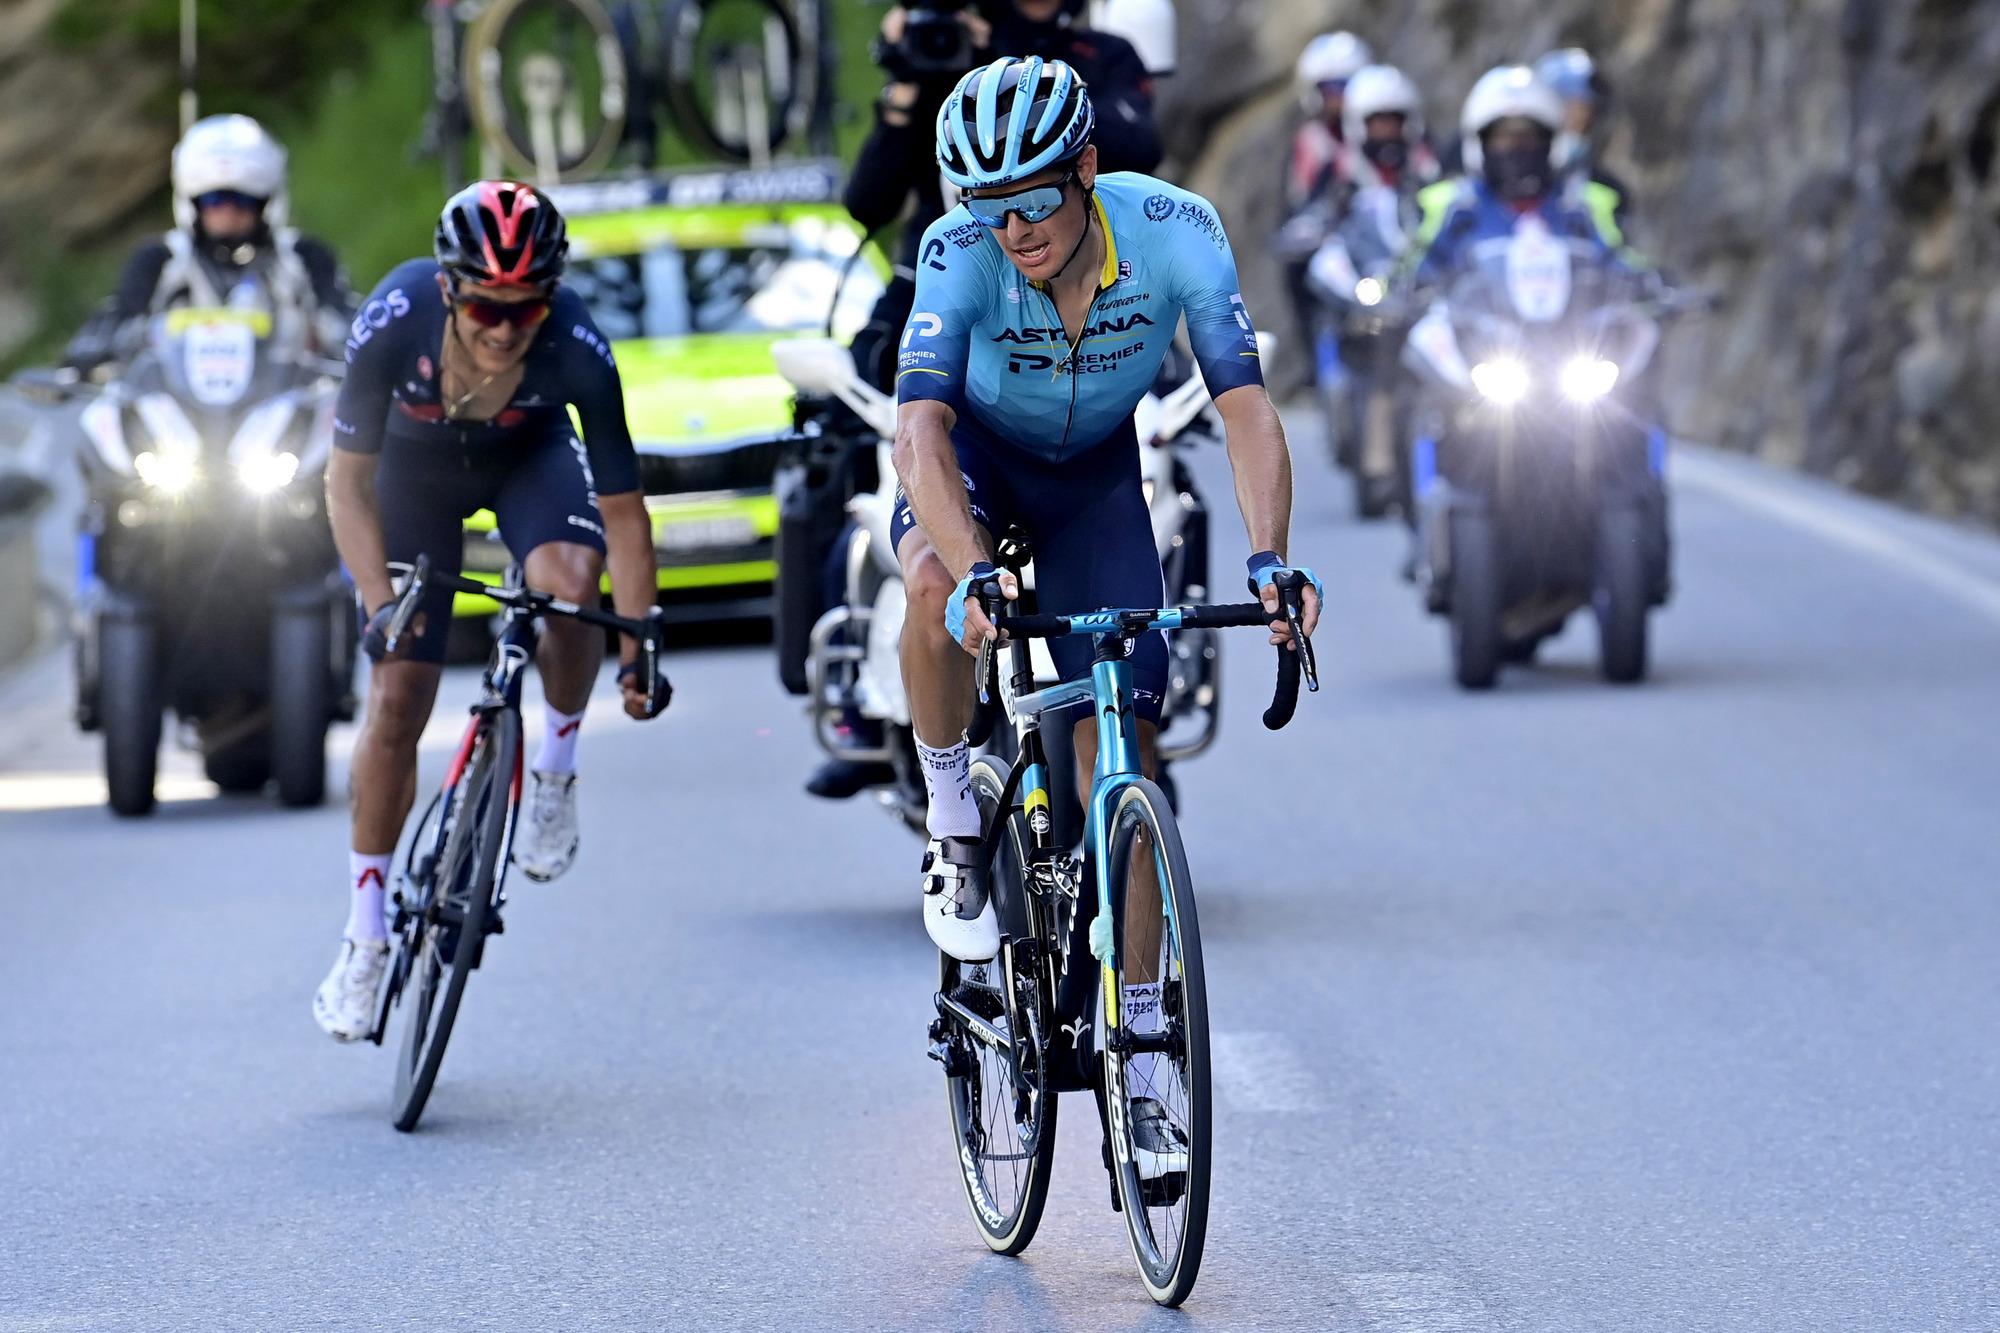 Tour de Suisse 2021 - 85th Edition - 5th stage Gstaad - Leukerbad 175,2 km - 10/06/2021 - Jakob Fuglsang (DEN - Astana - Premier Tech) - Richard Carapaz (ECU - Ineos Grenadiers) - photo Peter De Voecht/PN/BettiniPhoto©2021